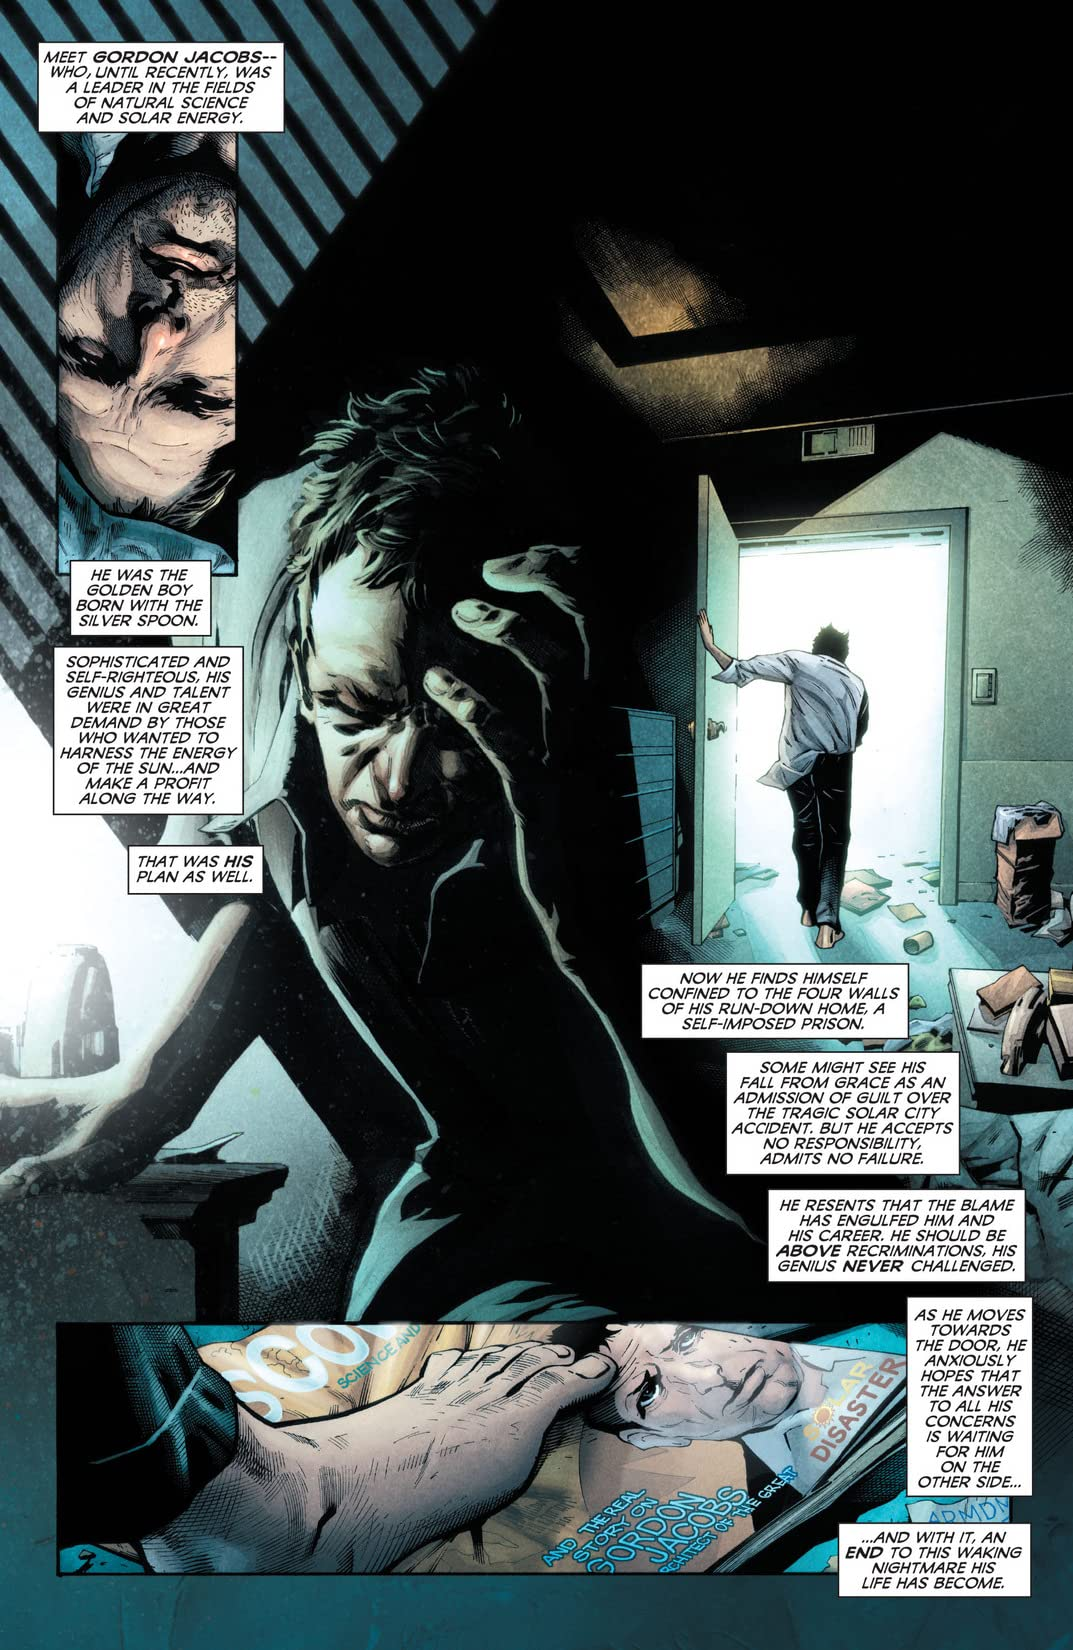 Justice League Dark (2011-2015) #23.2: Featuring Eclipso